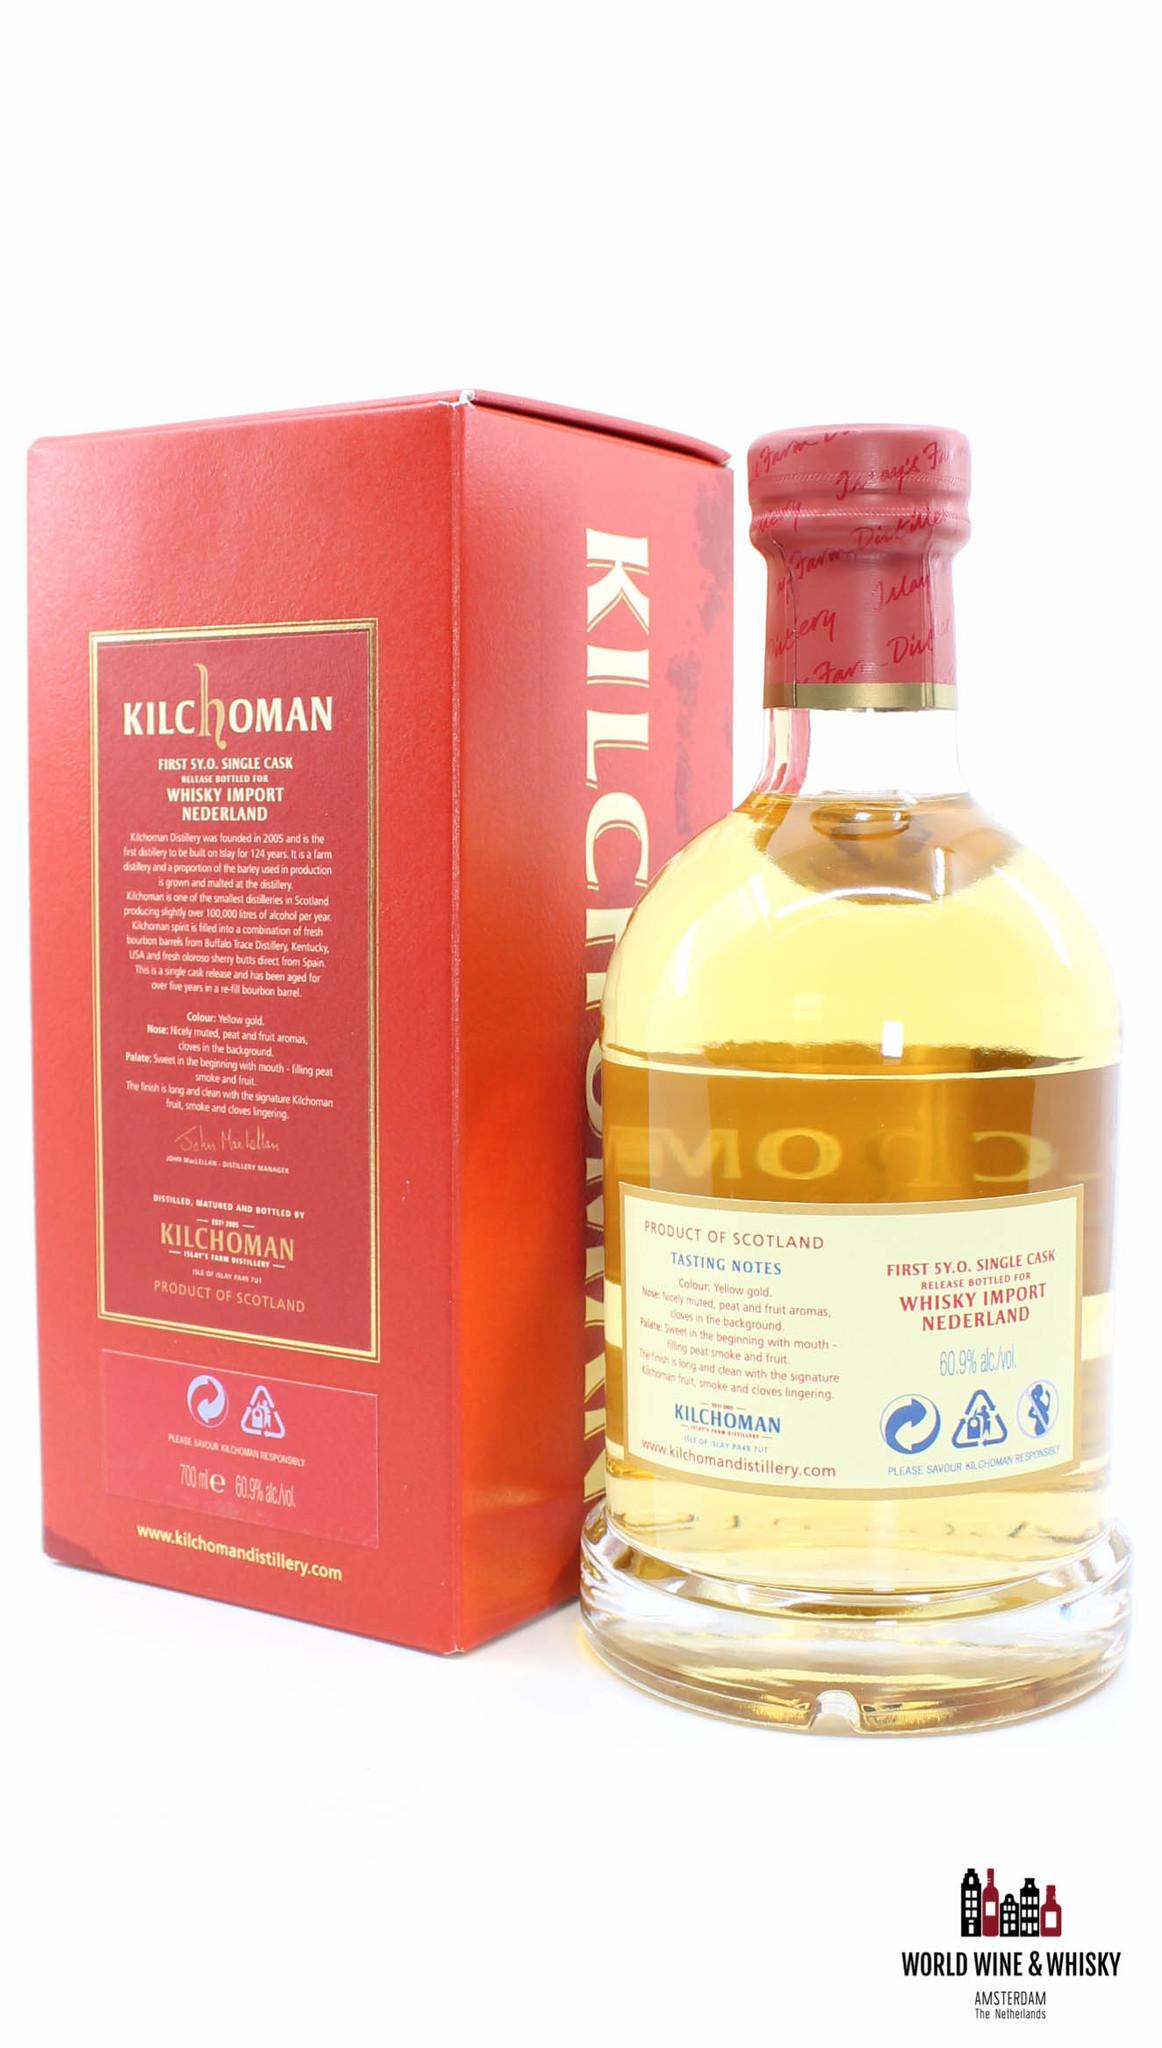 Kilchoman Kilchoman 5 Years Old 2006 2011 Single Cask Release - Whisky Import Nederland - Cask 99/2006 60.9% (one of 240 bottles)